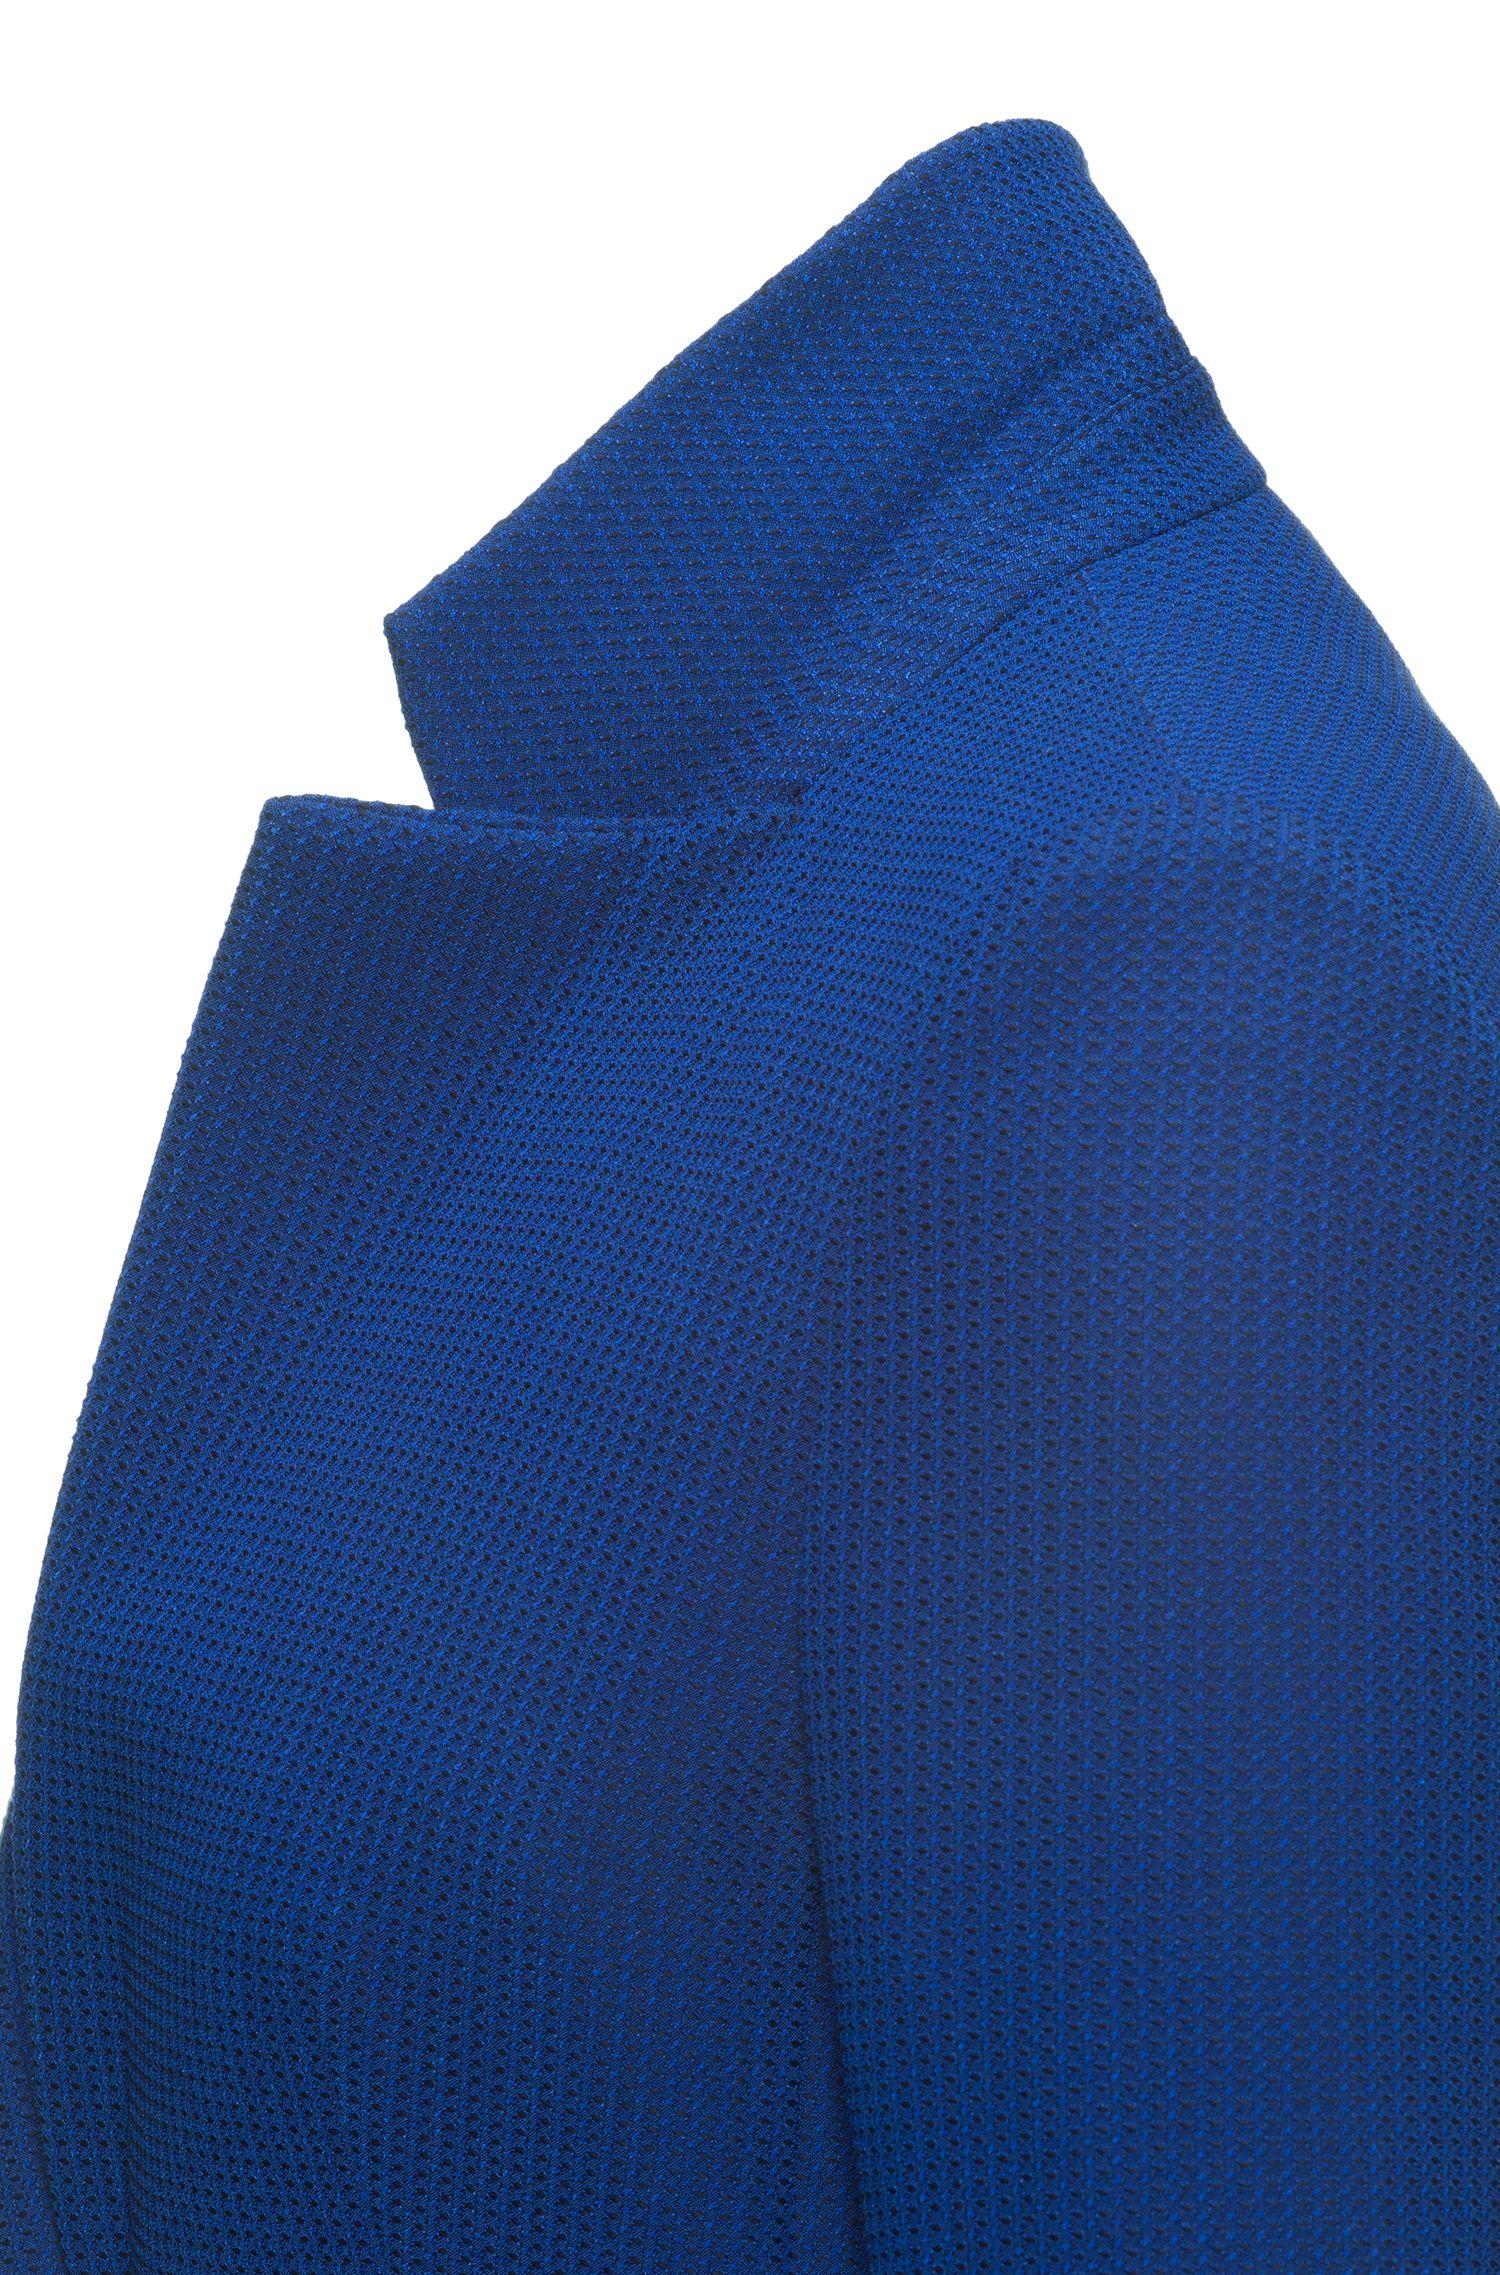 Patterned Cotton Blend Blazer   Asima